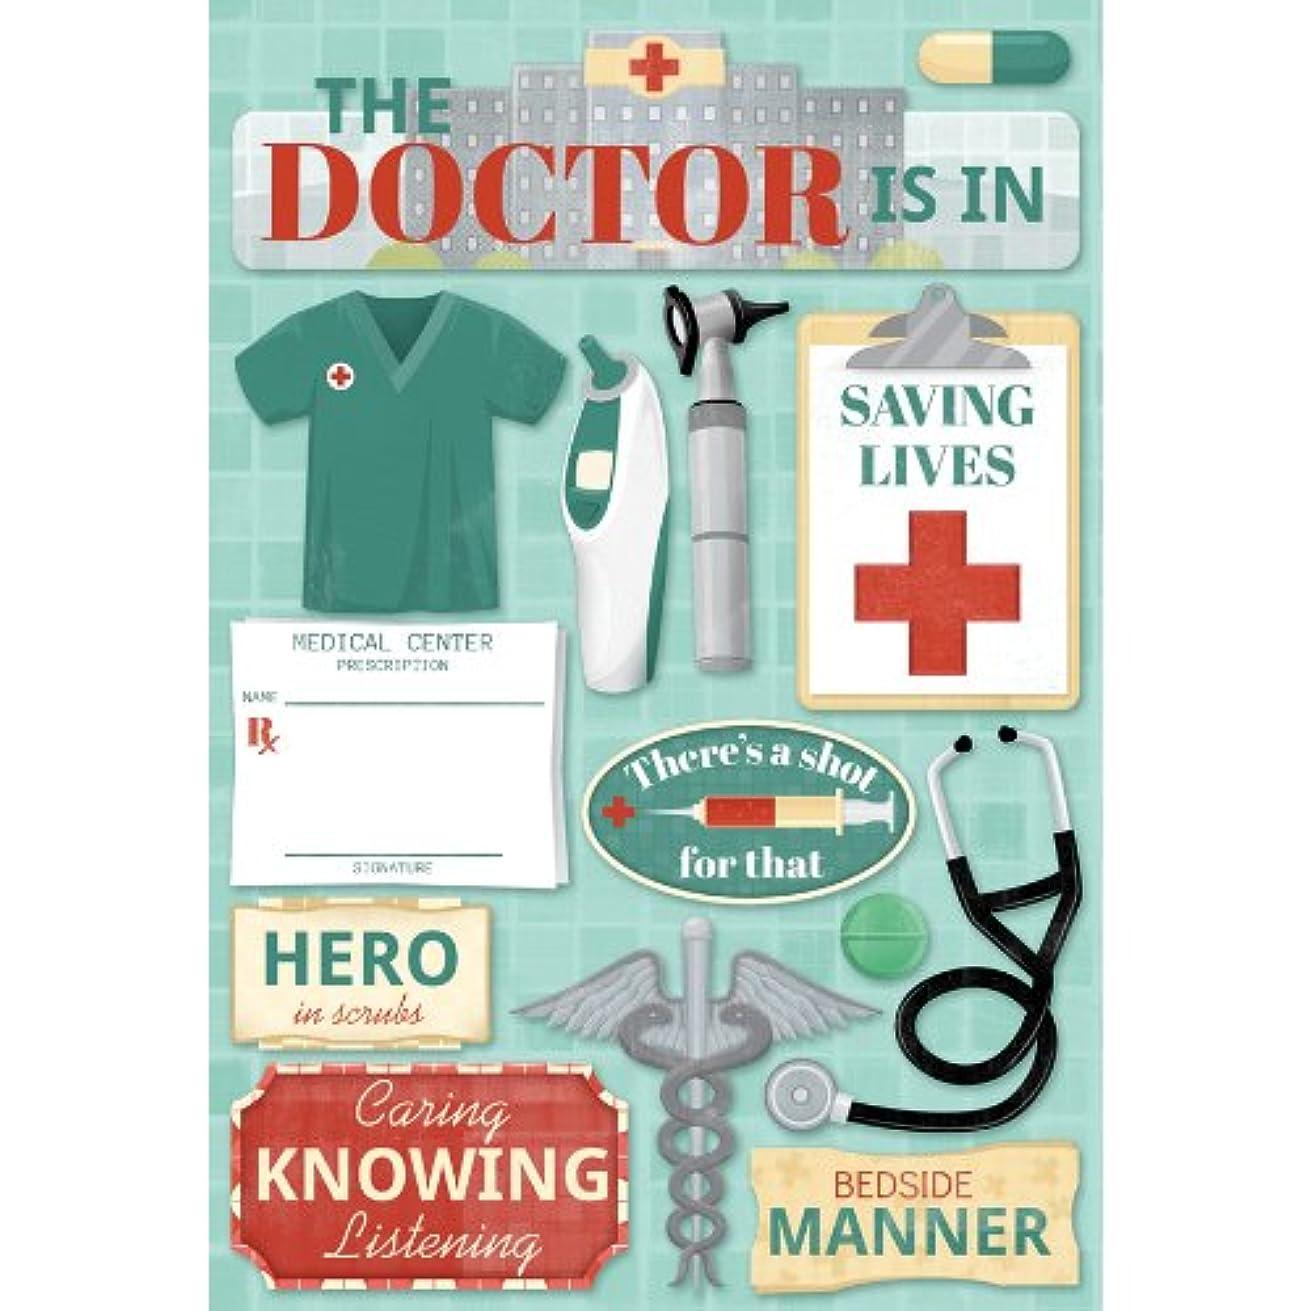 KAREN FOSTER 11587 Design Acid and Lignin Free Scrapbooking Sticker Sheet, The Doctor is in